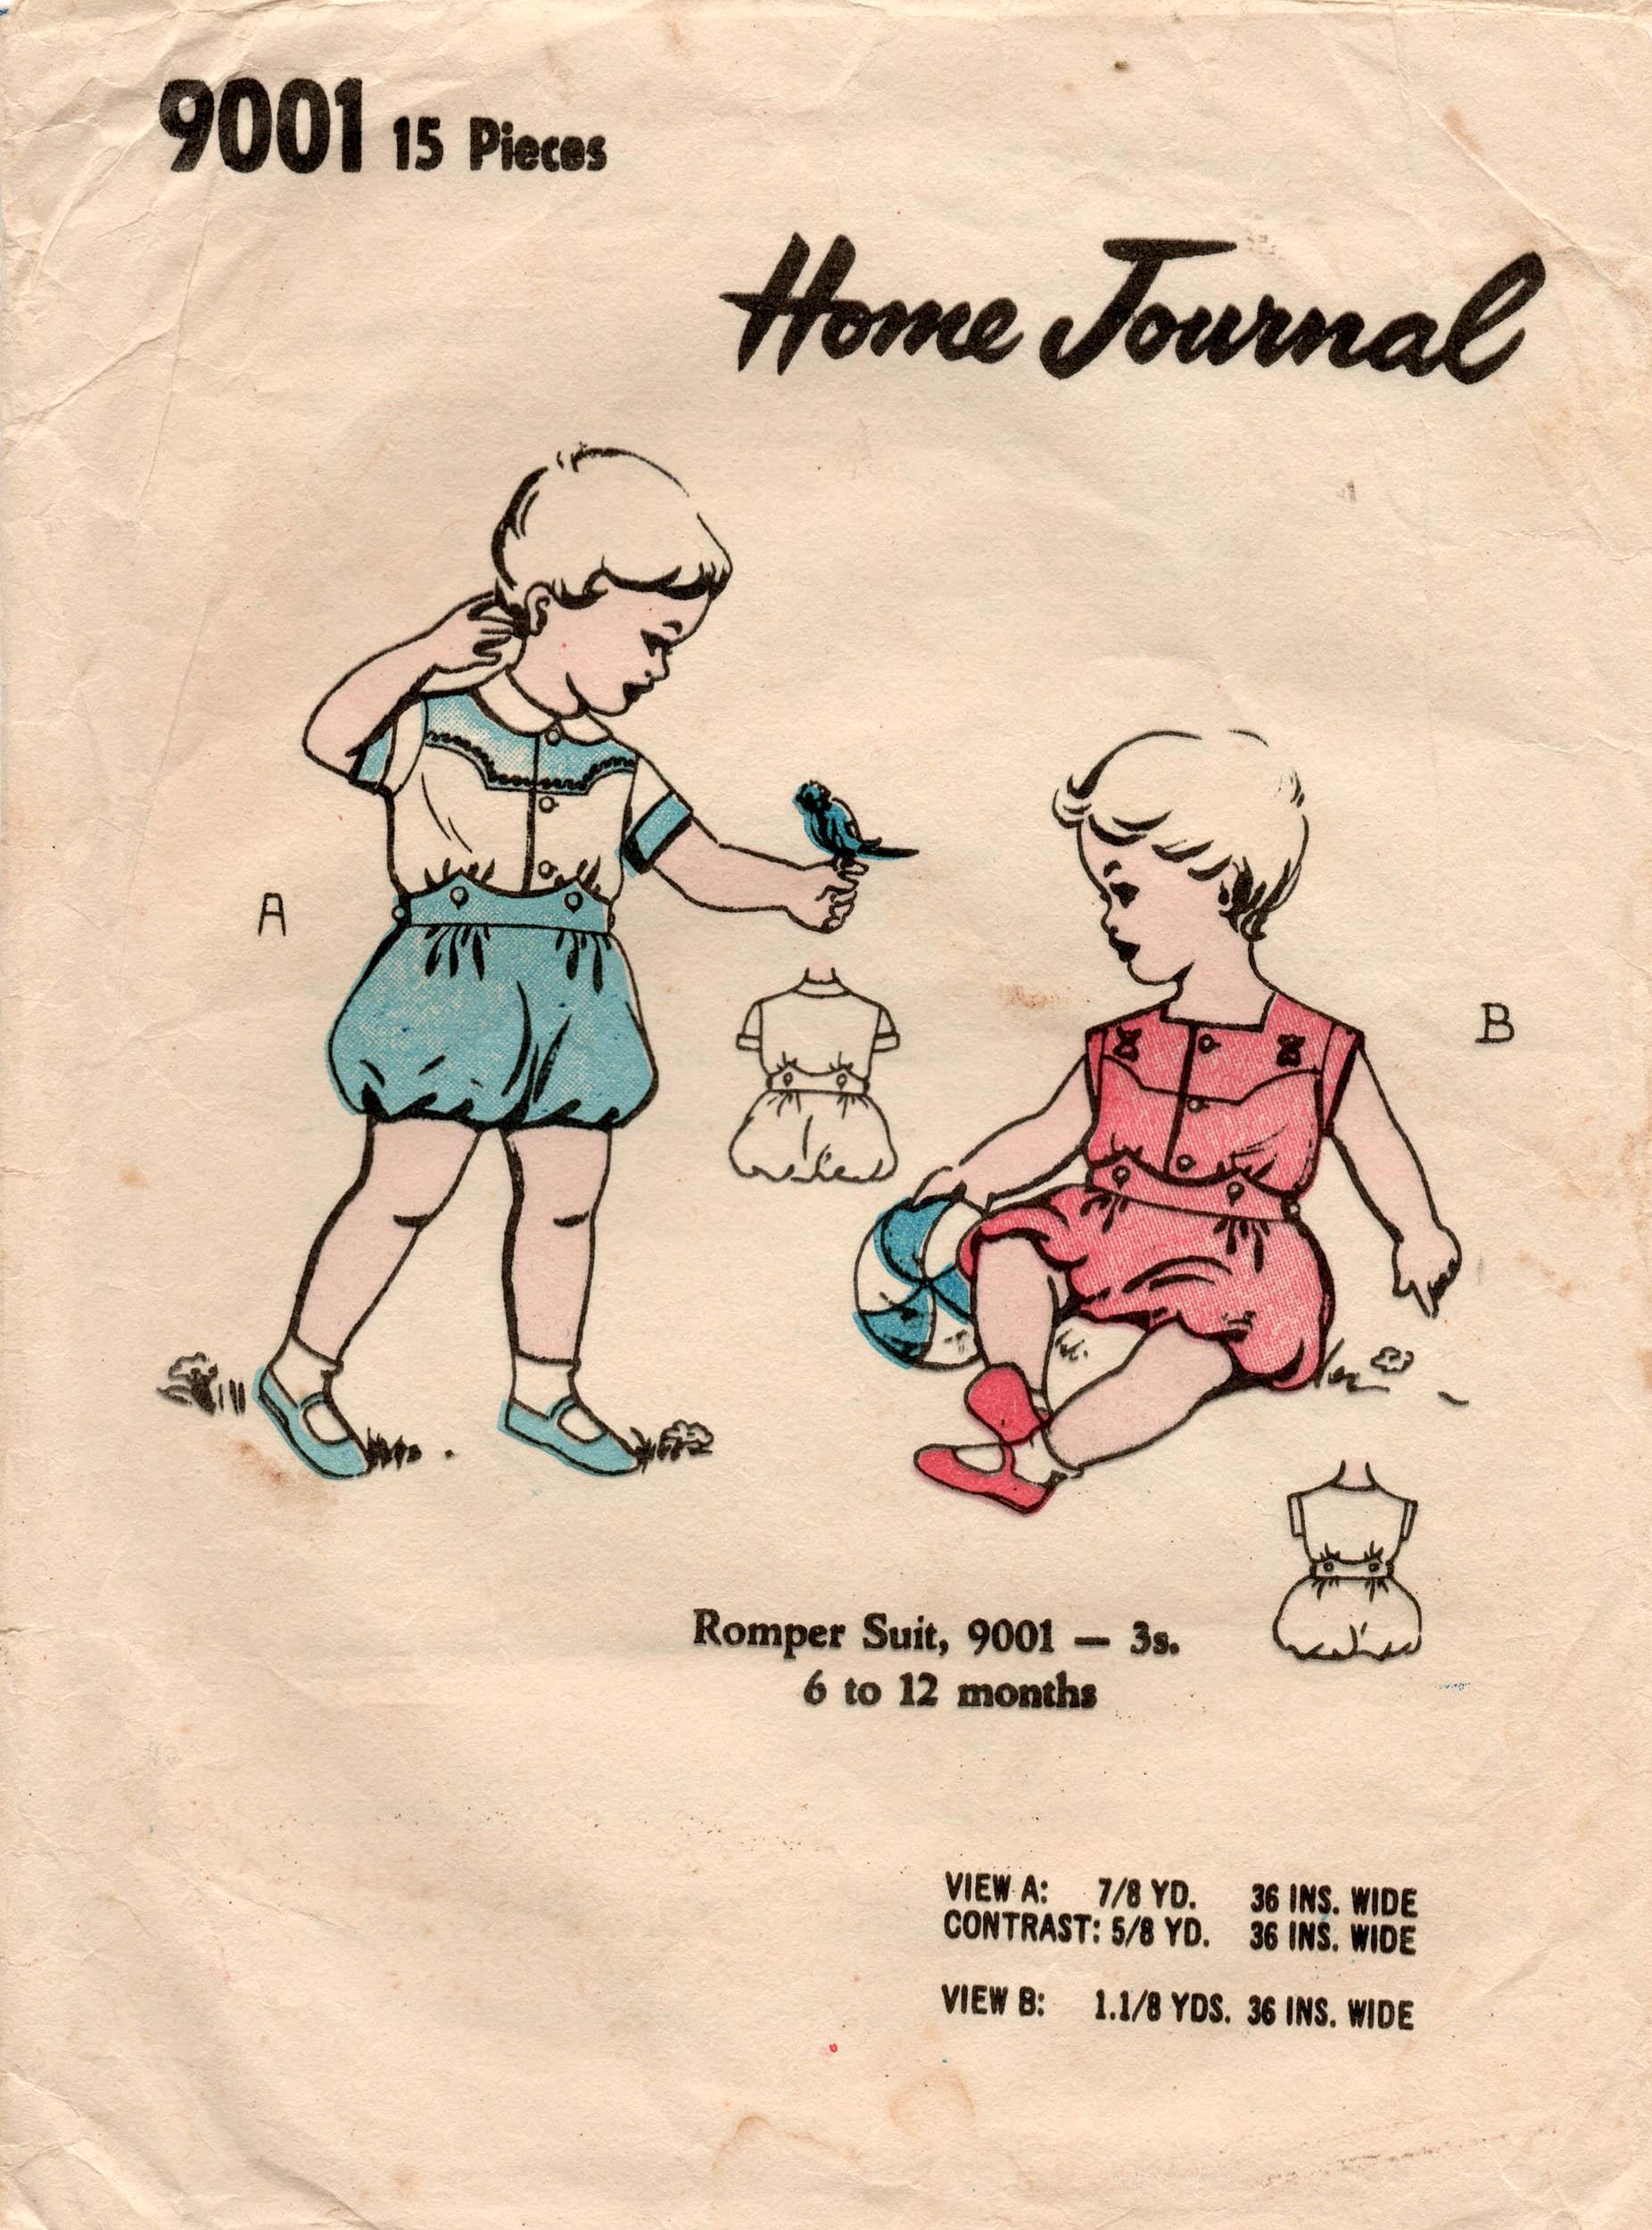 Australian Home Journal 9001